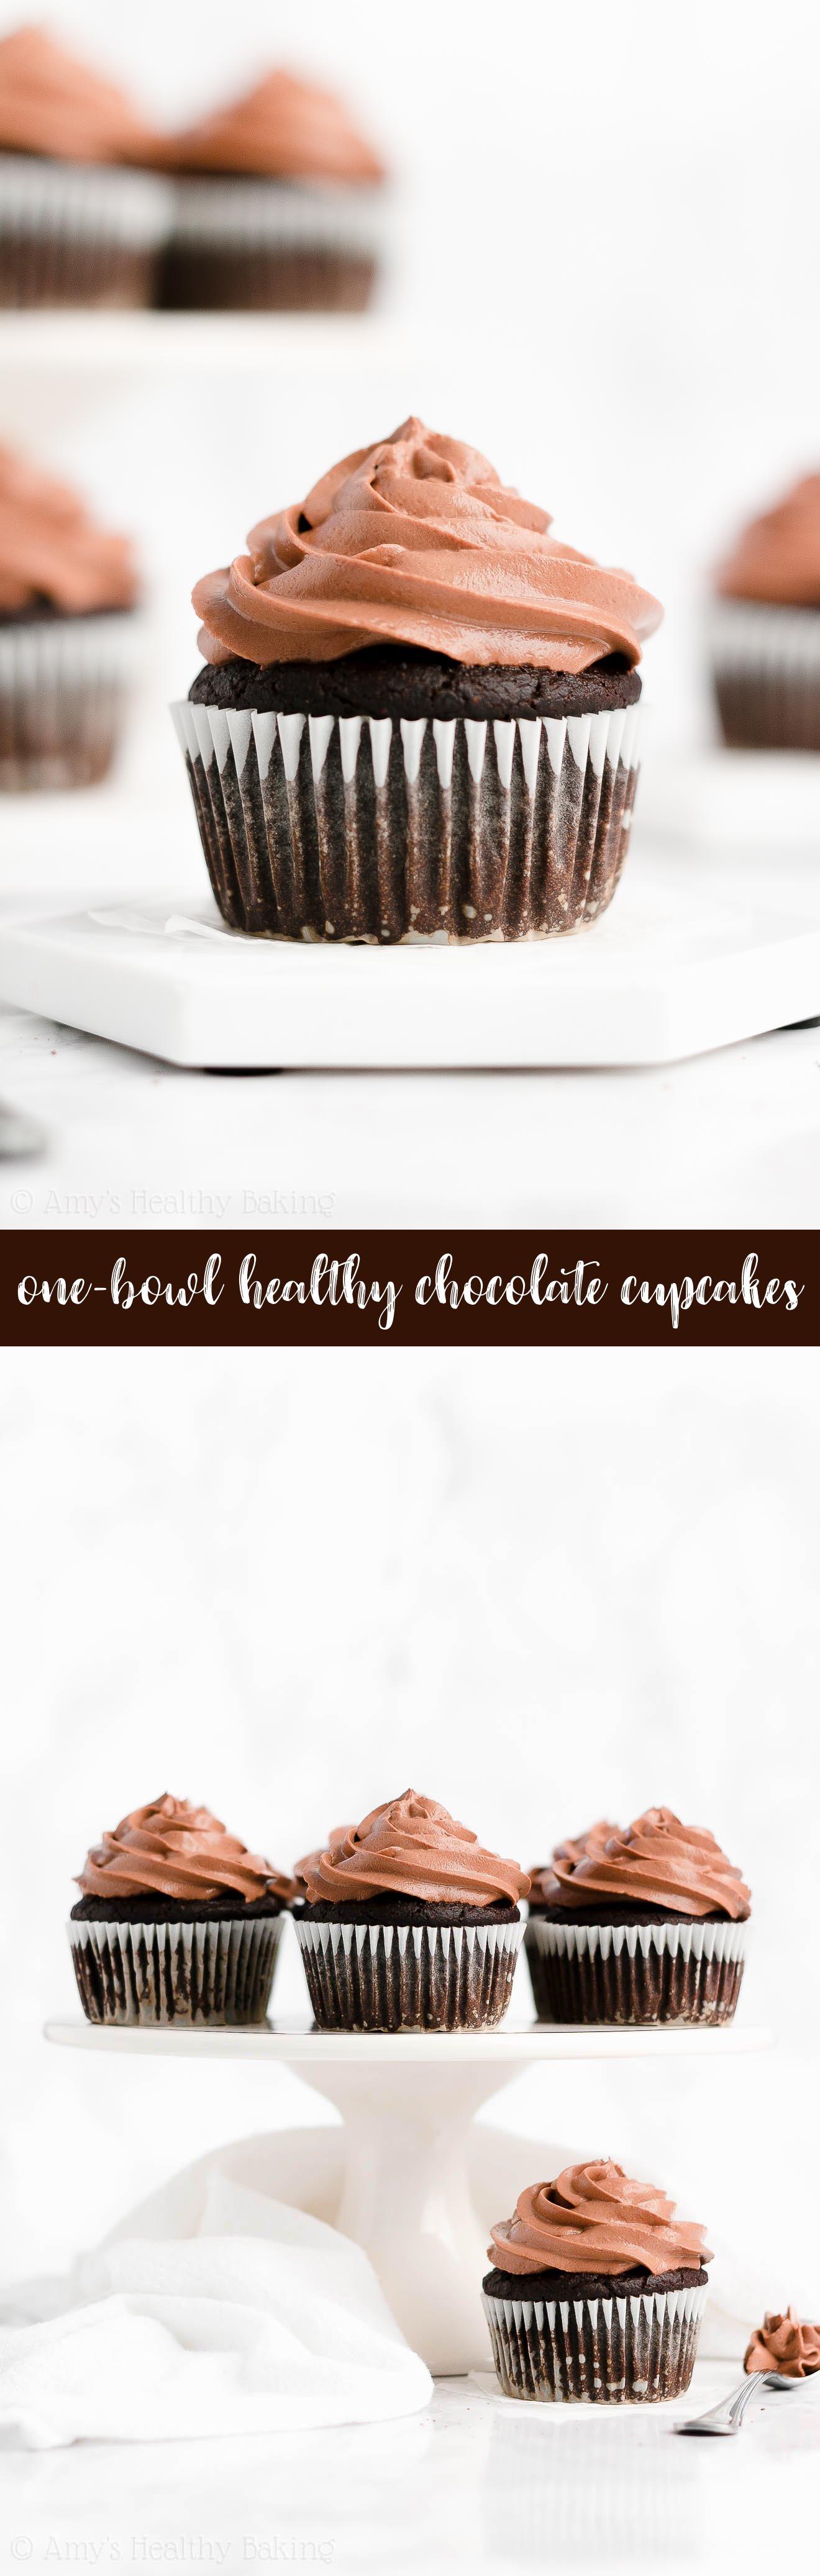 Best Ever Easy Healthy No Sugar One-Bowl Greek Yogurt Dark Chocolate Cupcakes